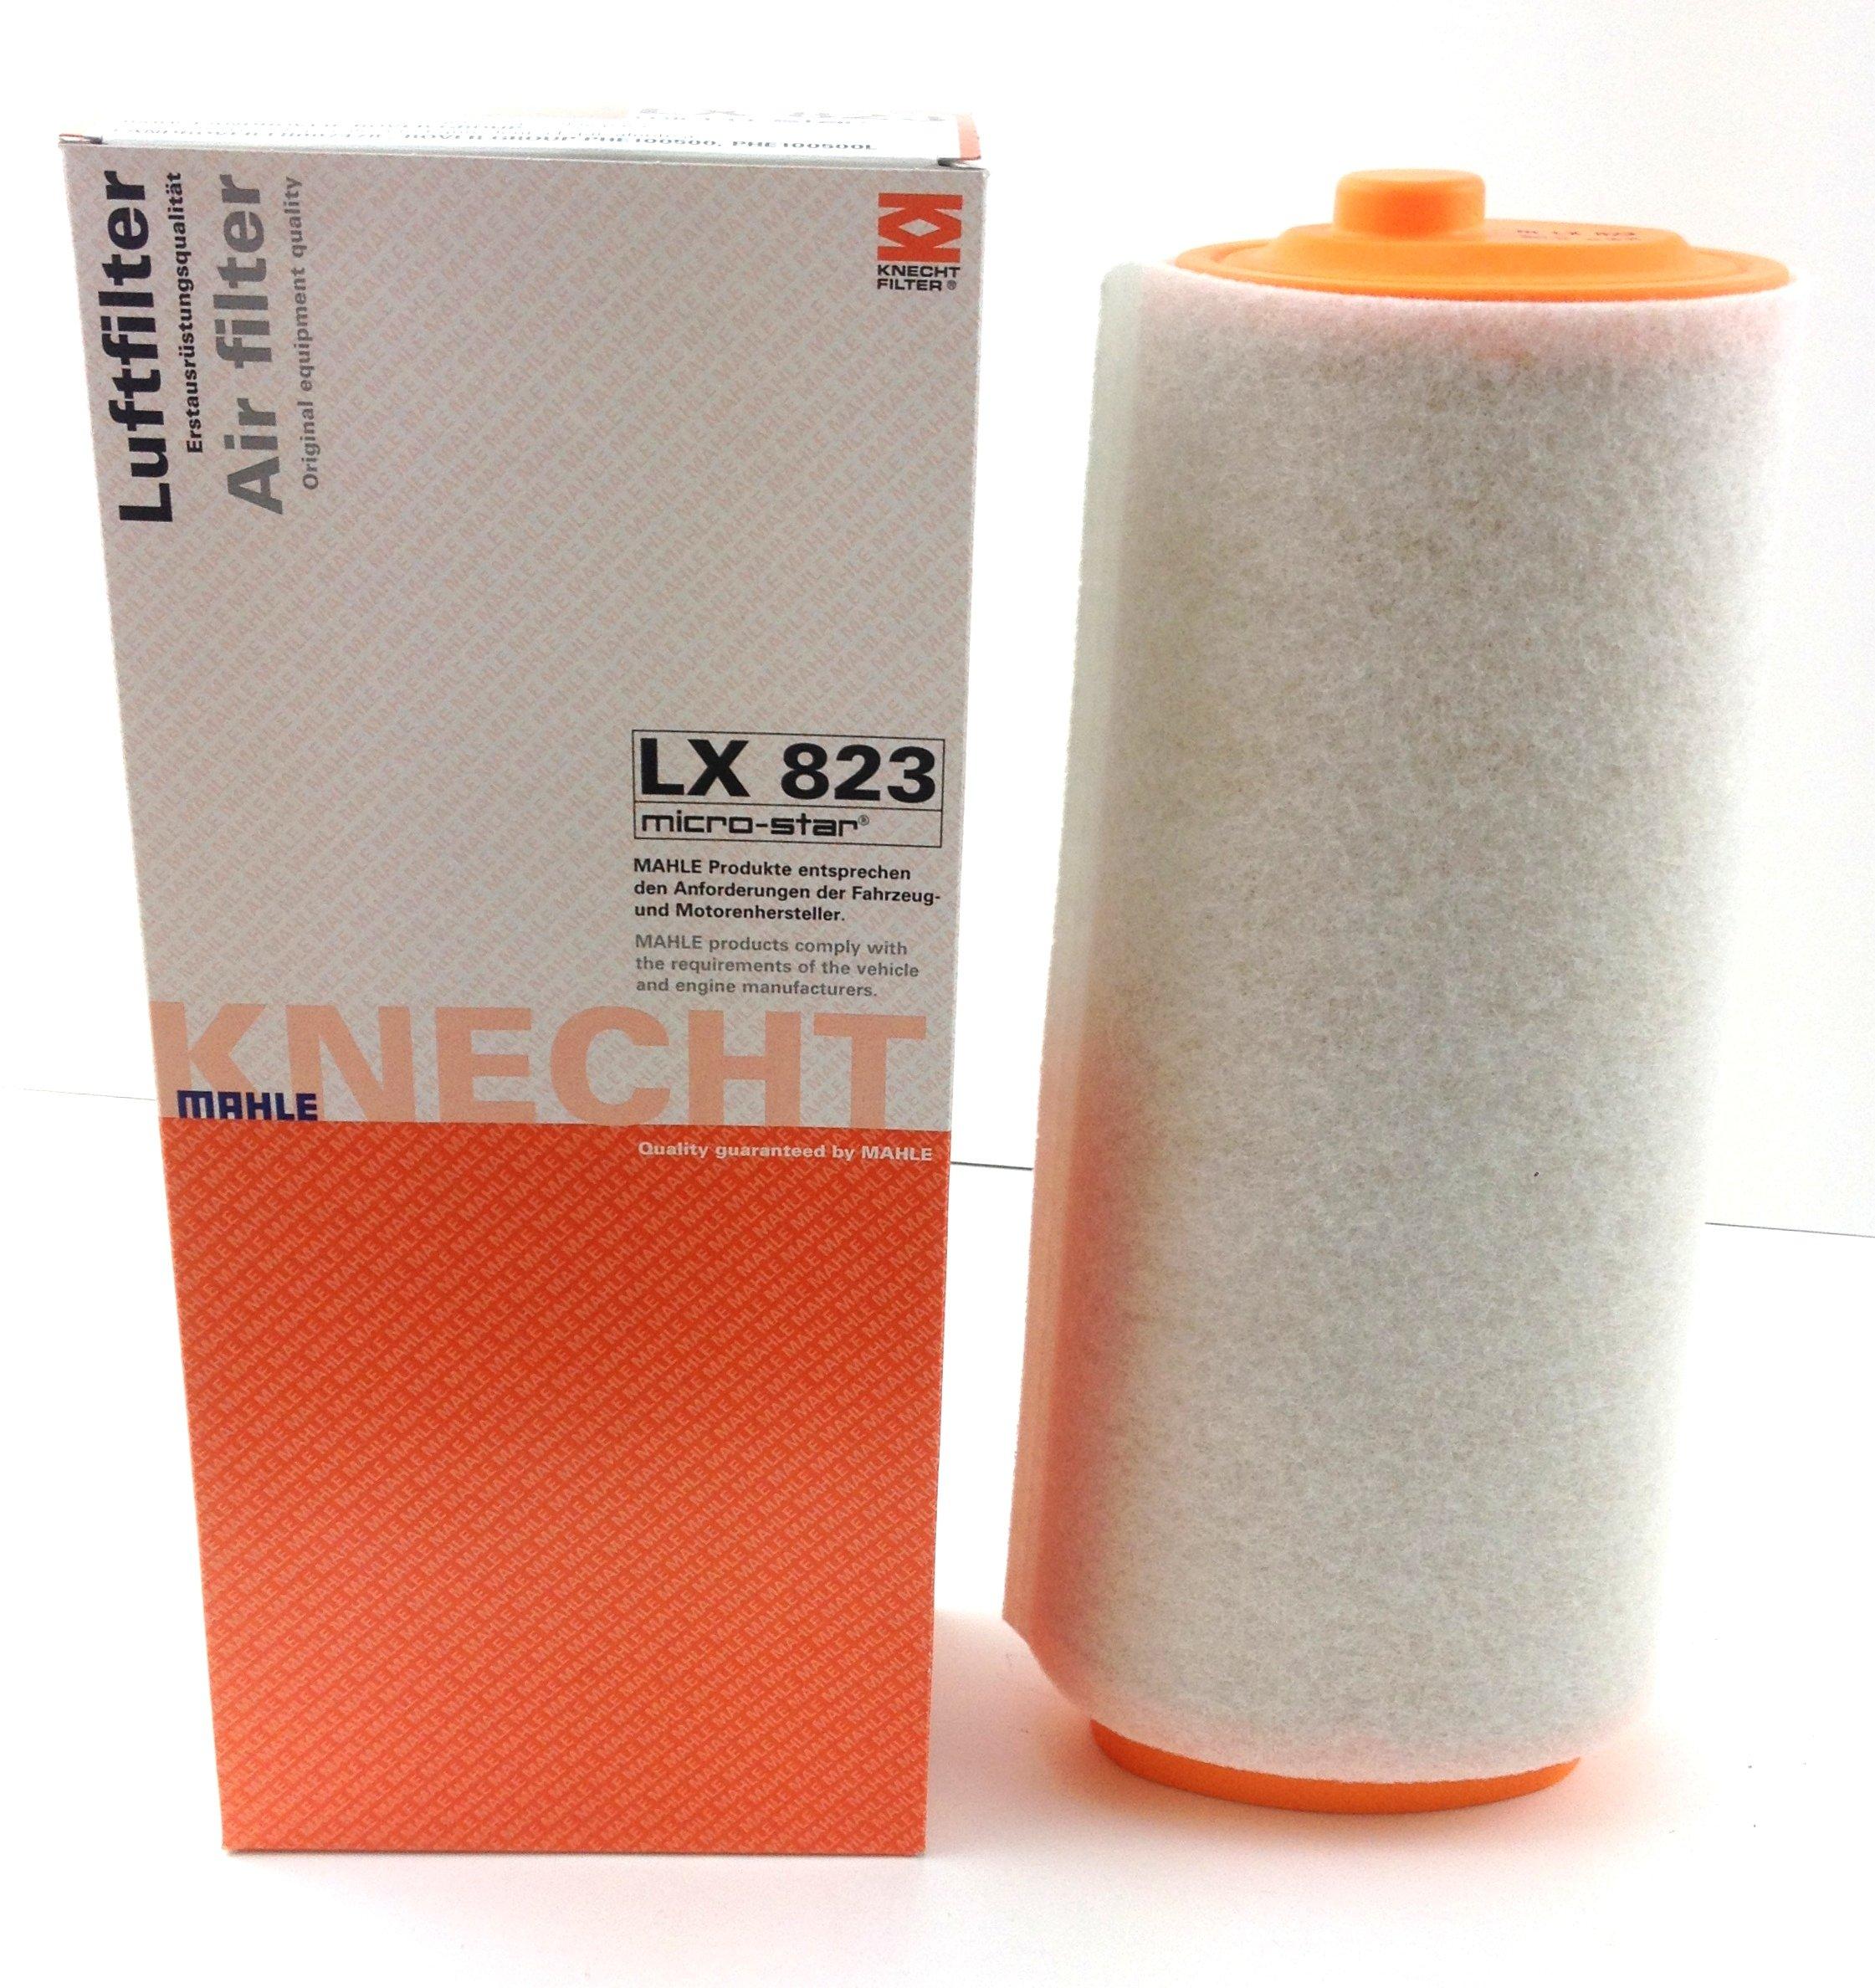 LX 823